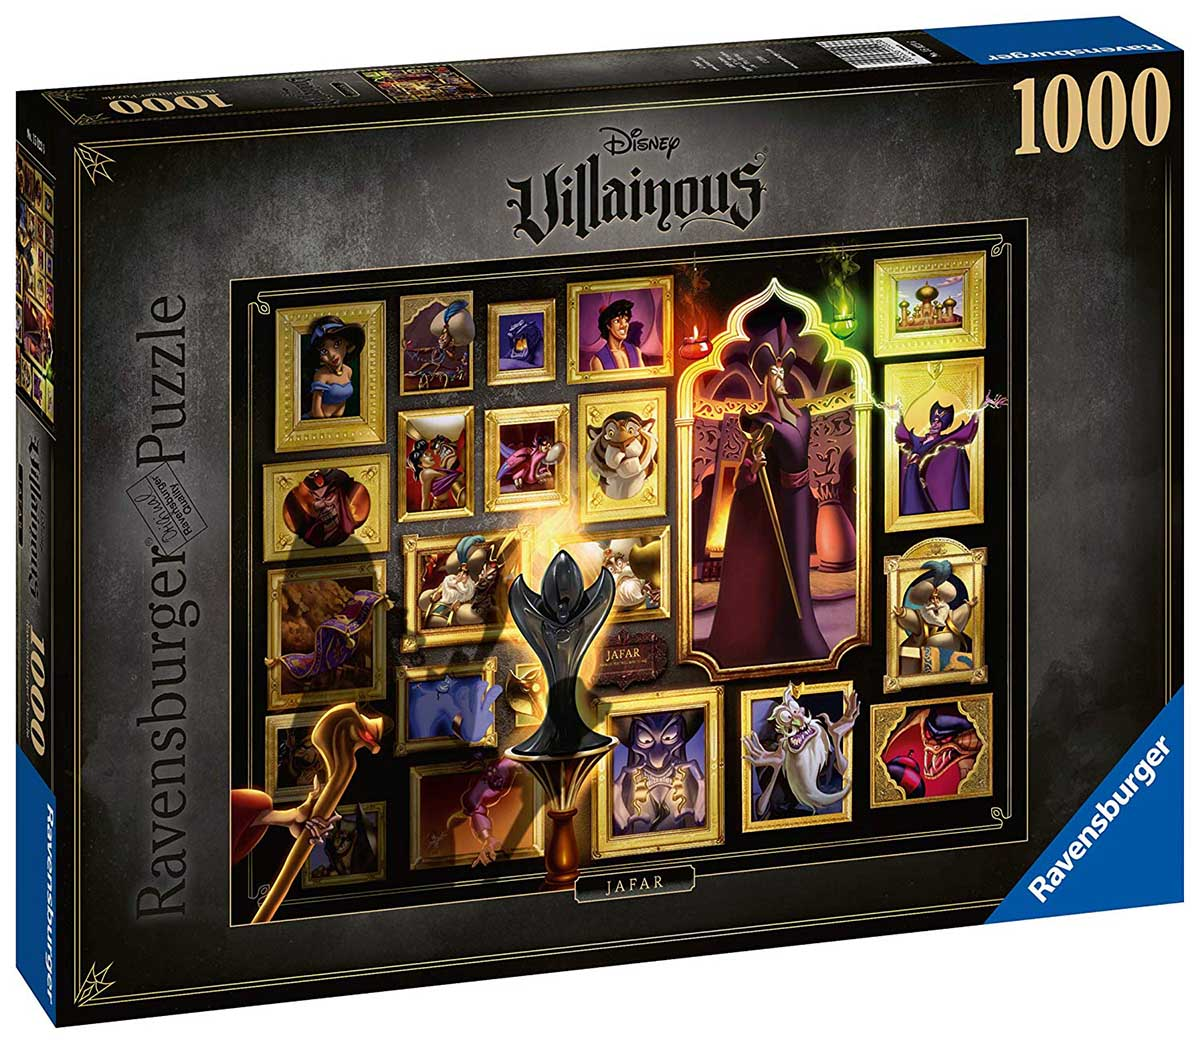 Villainous: Jafar Disney Jigsaw Puzzle